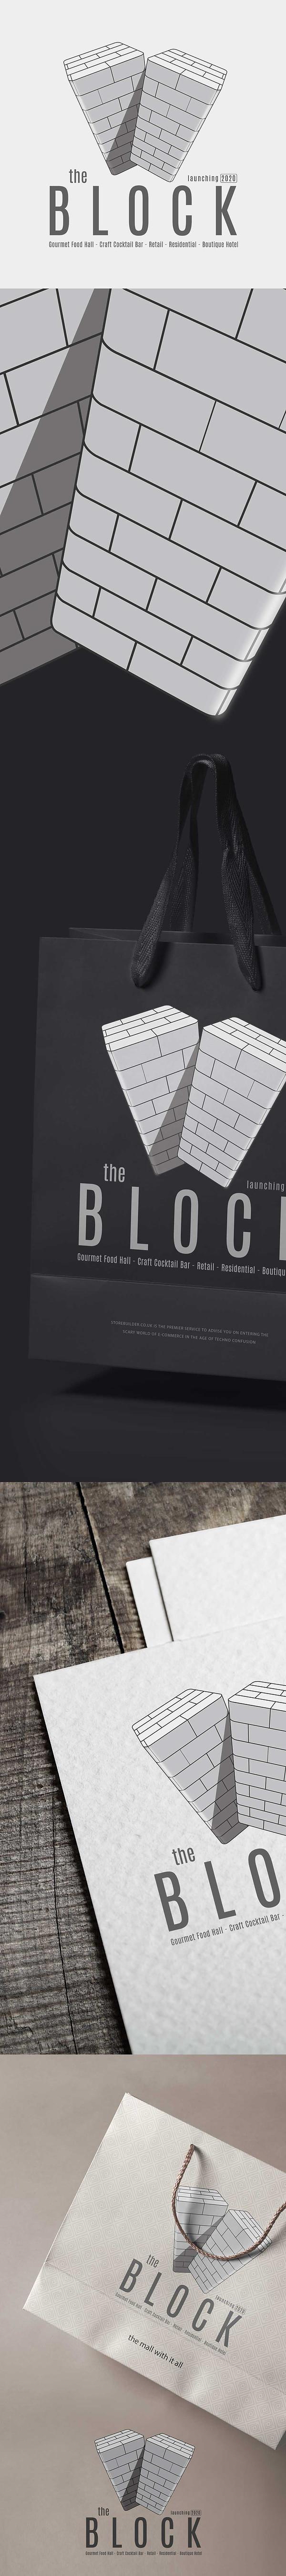 Vertical-The-Block-1.jpg